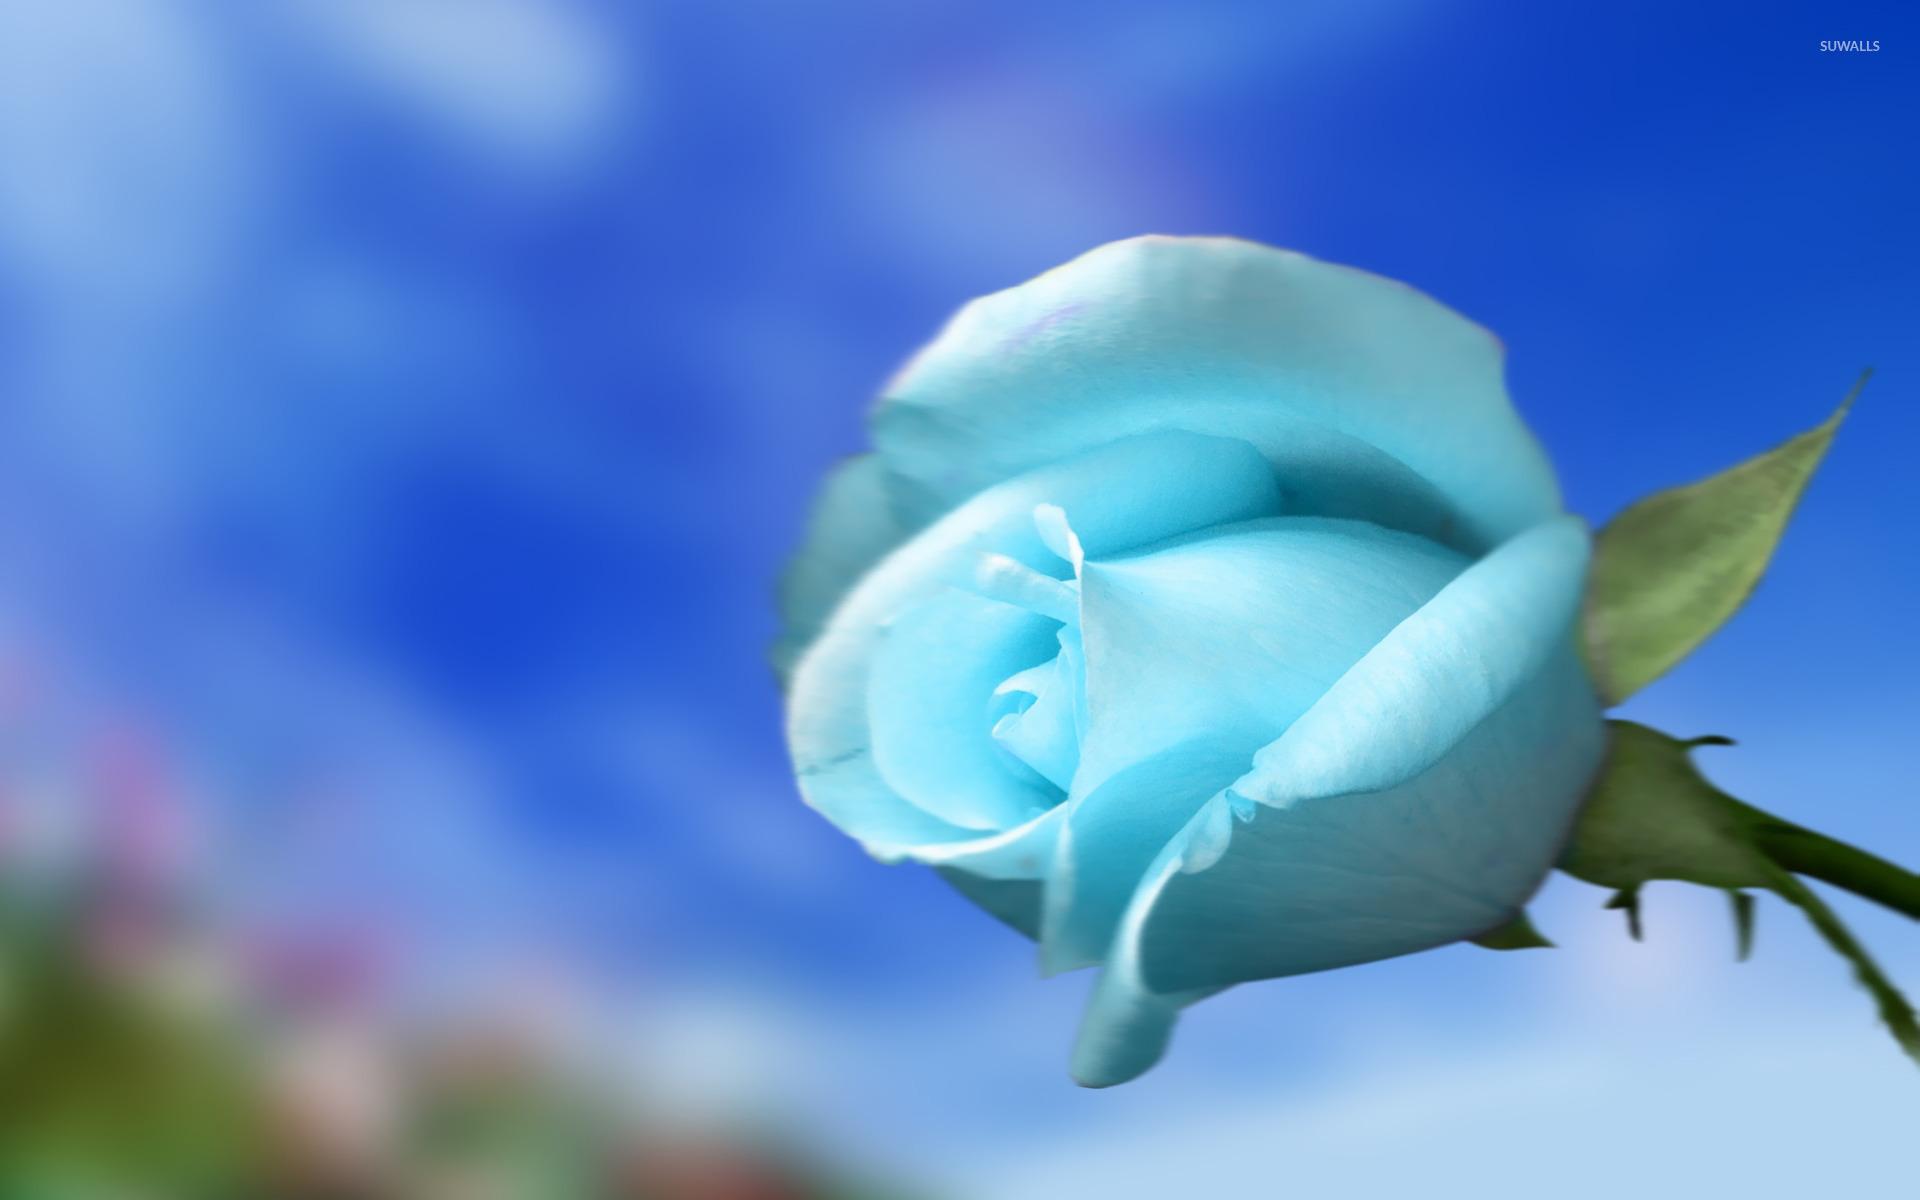 sky blue rose wallpaper - flower wallpapers - #18800